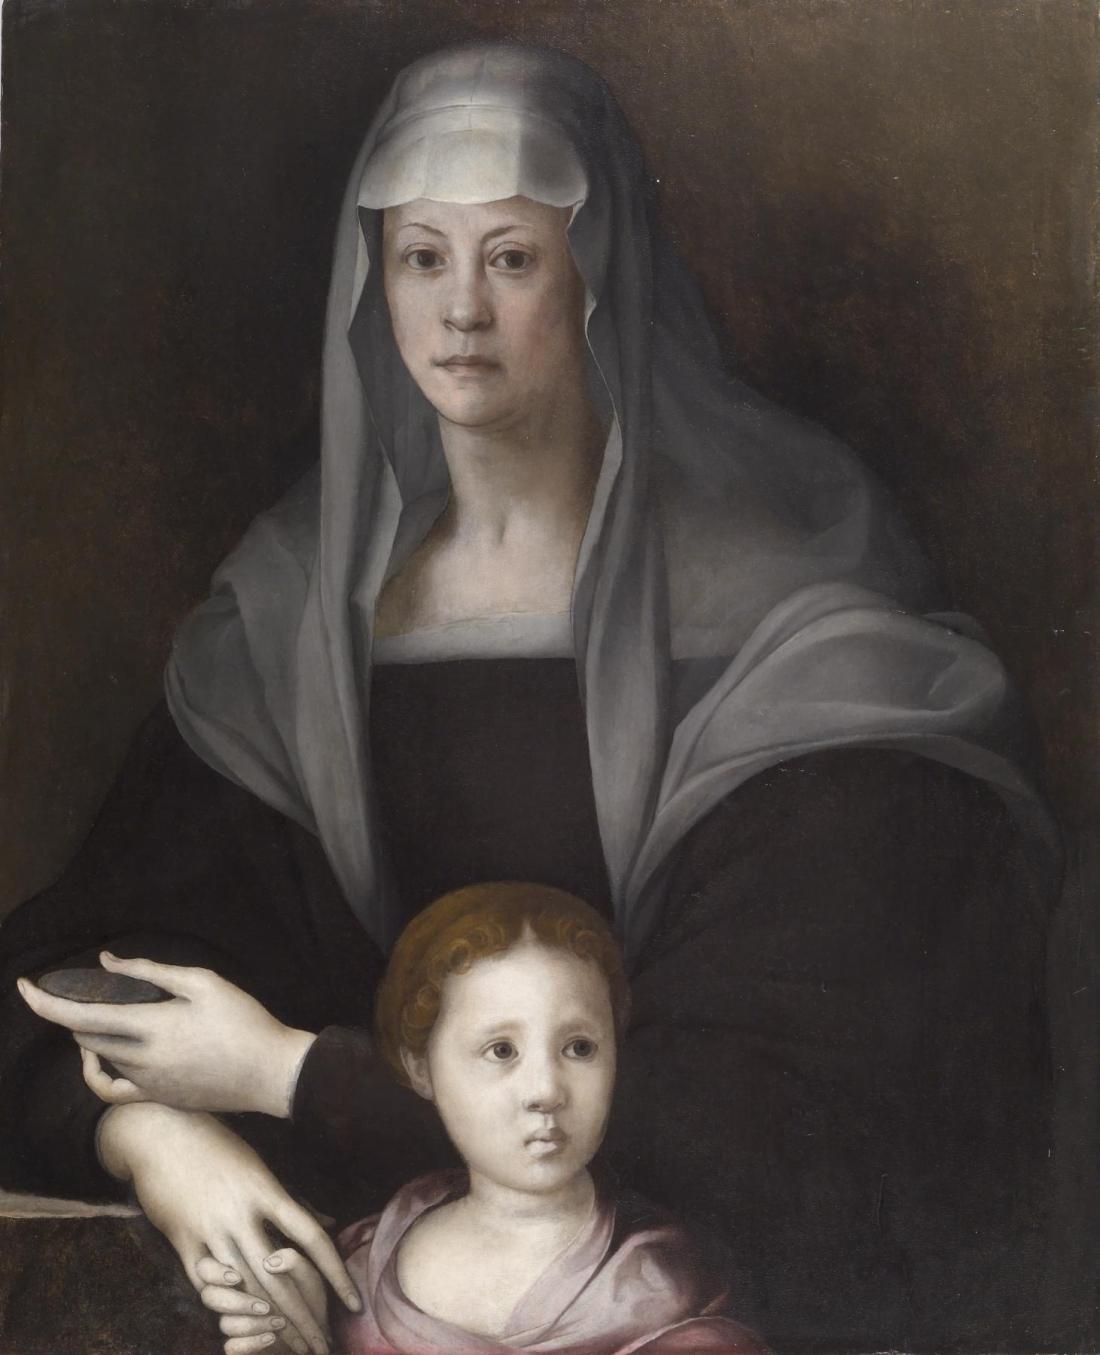 Jacopo Pontormo, Portrait of Maria Salviati de' Medici and Giulia de' Medici, ca. 1539. Collection of the Walters Art Museum.